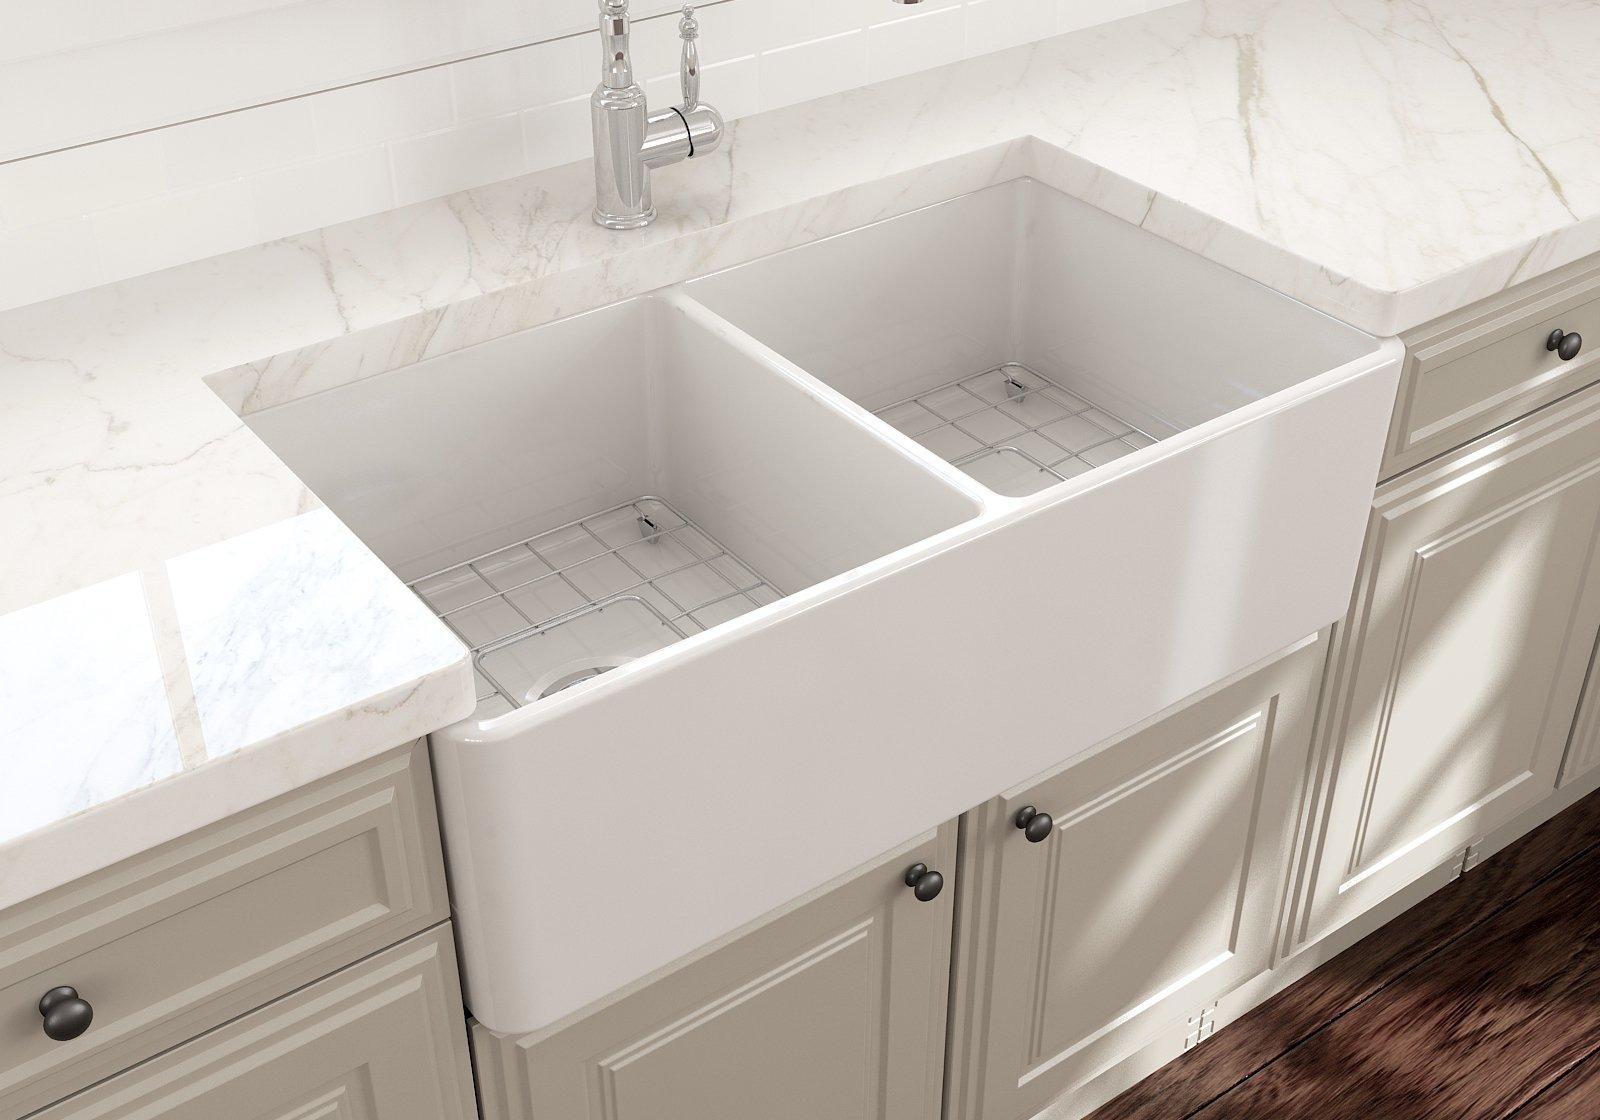 White Double Bowl Farmhouse Sink.Classico 33d Farmhouse Apron Front Fireclay 33 Double Bowl